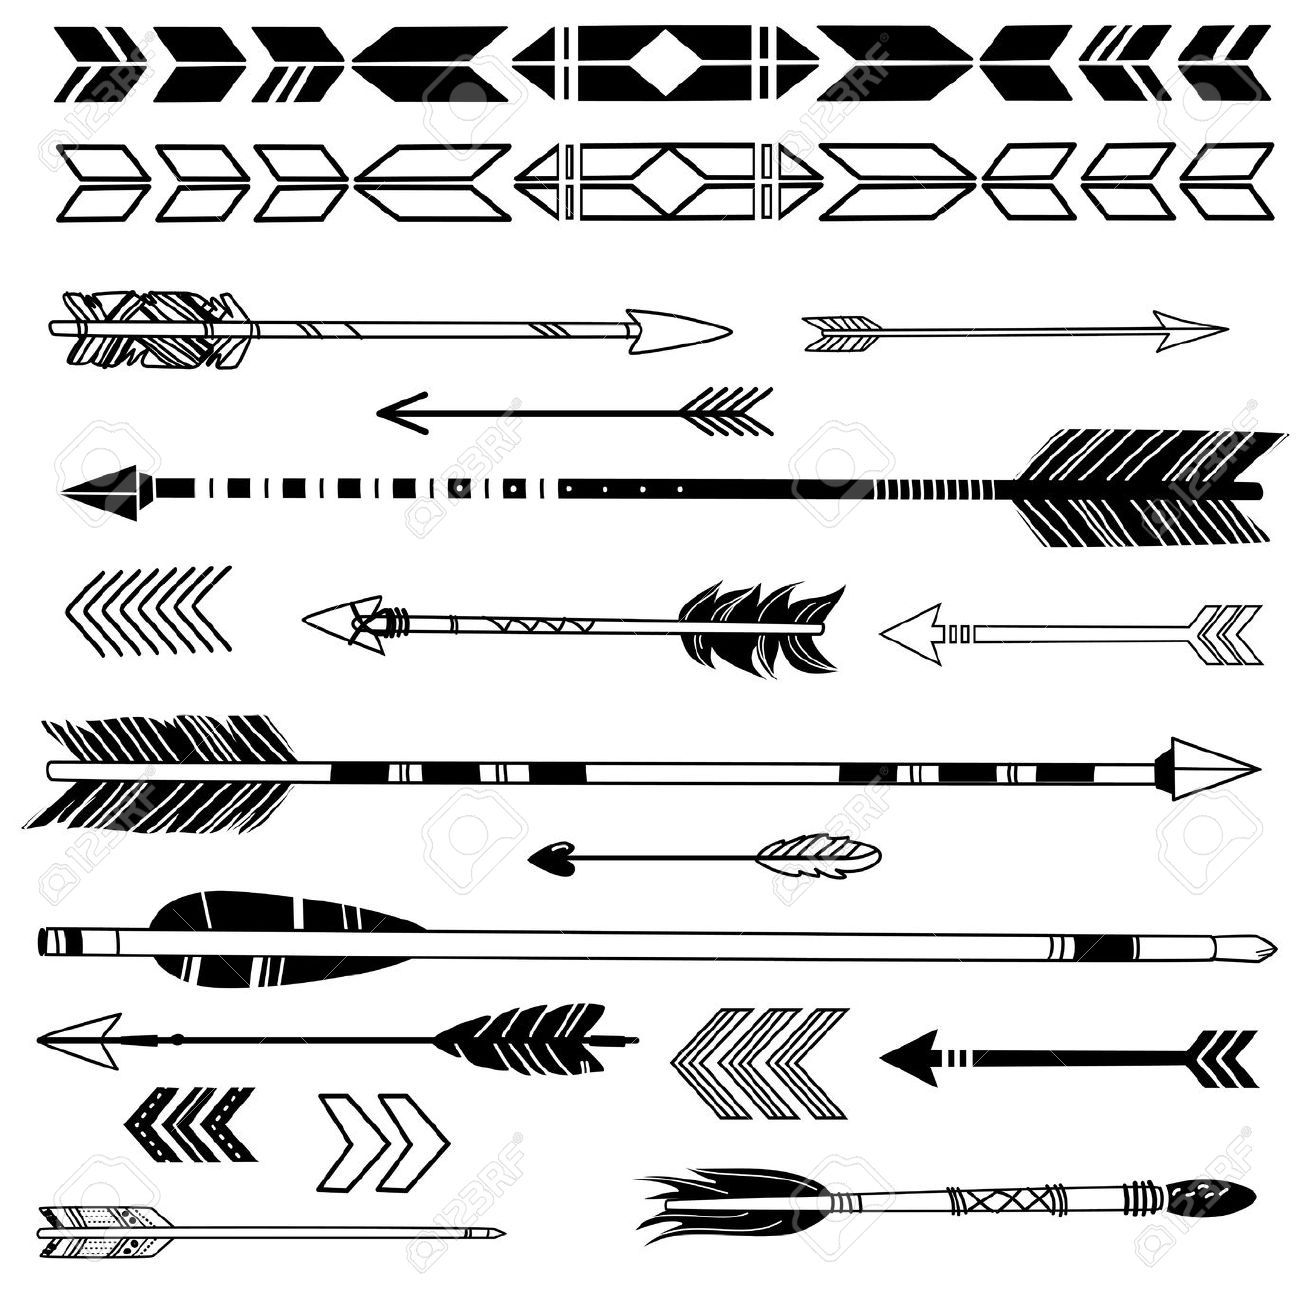 25077355 A Set Of Cute Hipster Arrows Hand Drawn Doodles Stock Vector Arrow Indian Native Jpg 1300 1300 Tatoeage Ideeen Tatoeage Pijl